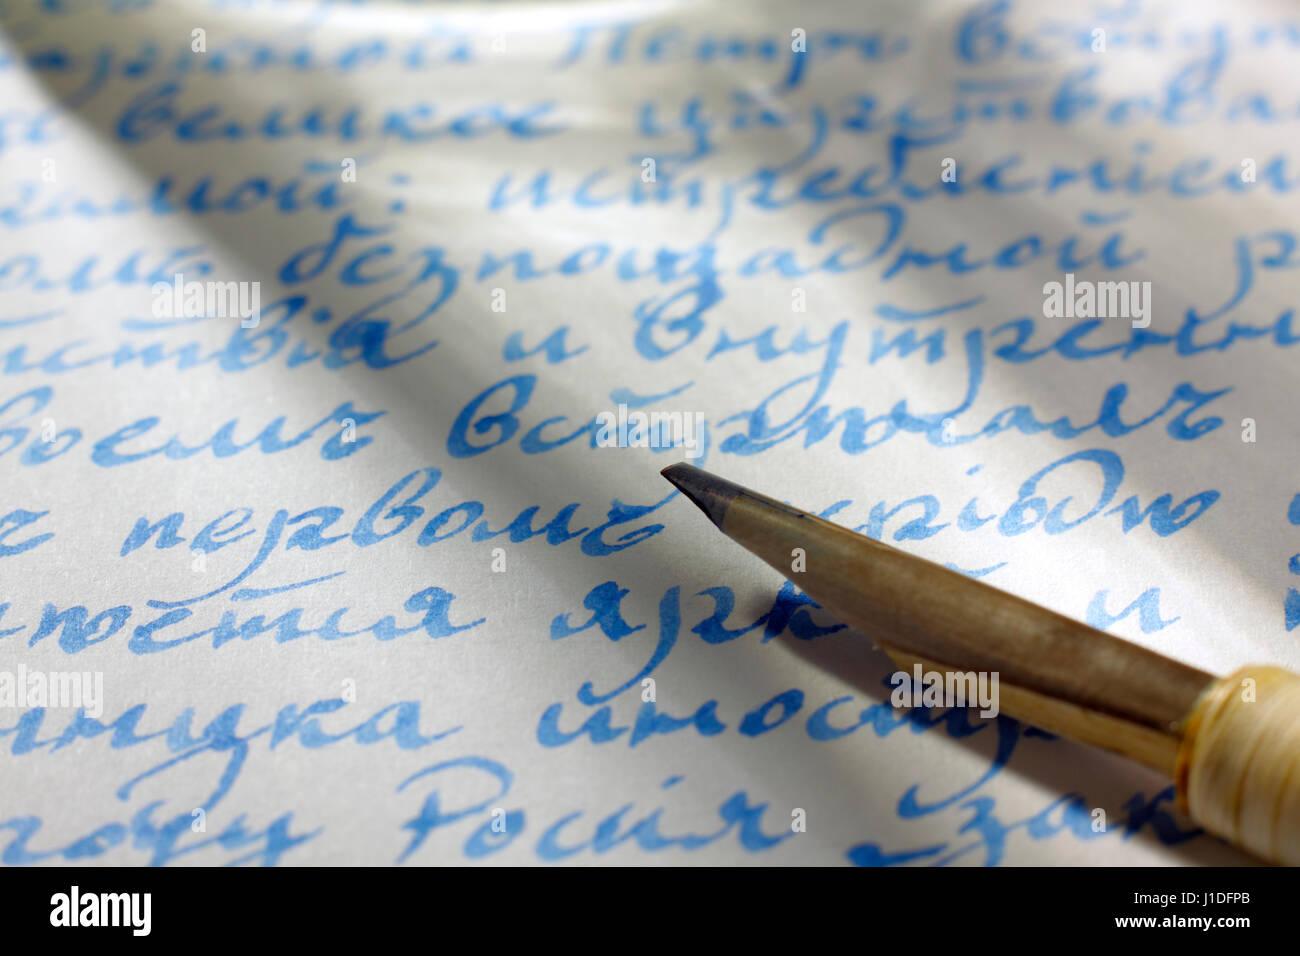 Handwritten text in cyrillic script (Russian language, old